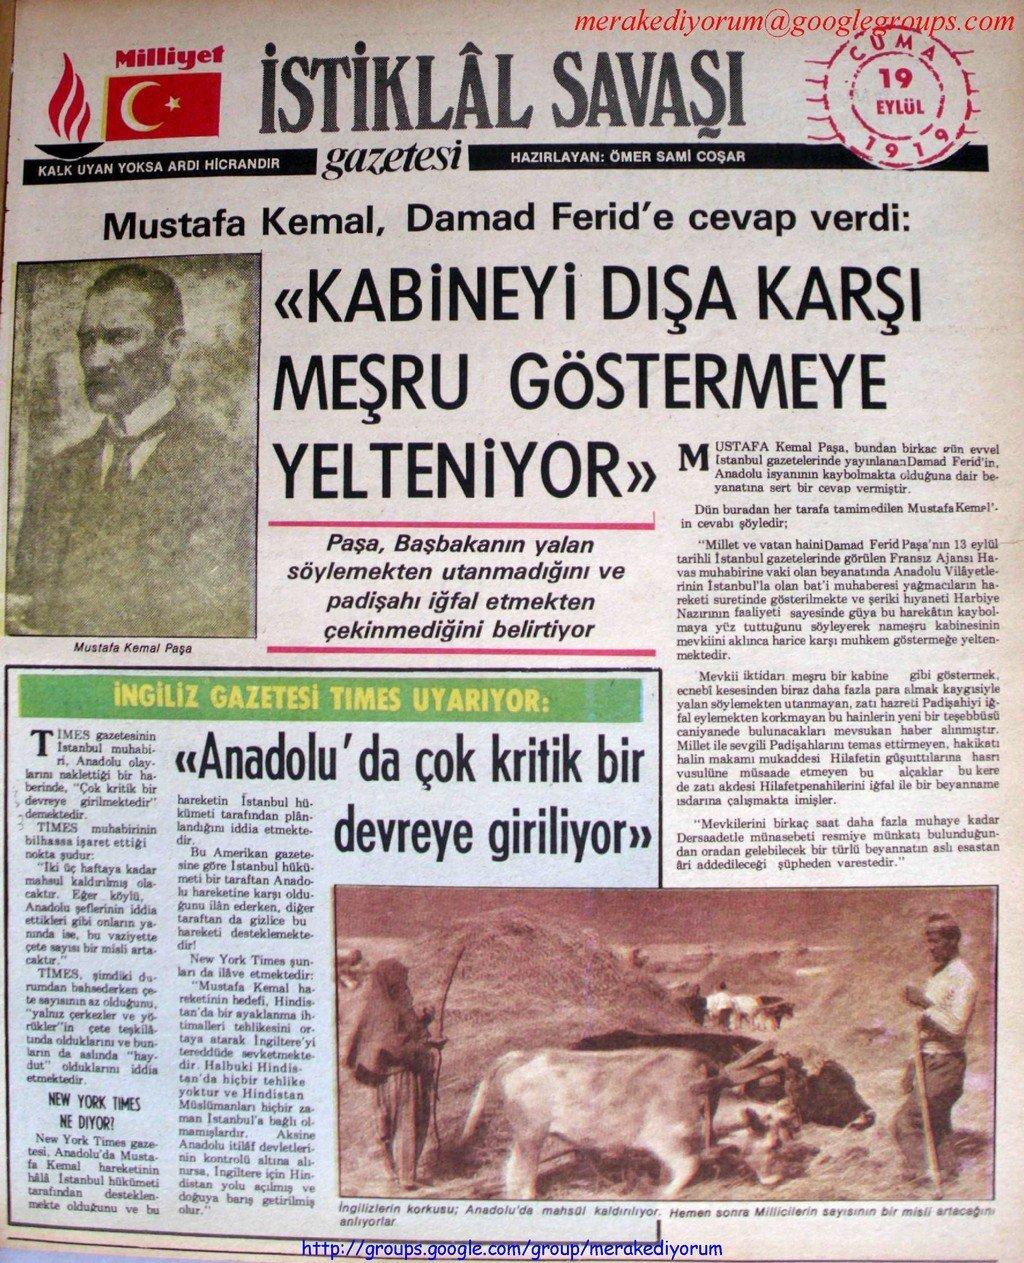 istiklal savaşı gazetesi - 19 eylül 1919